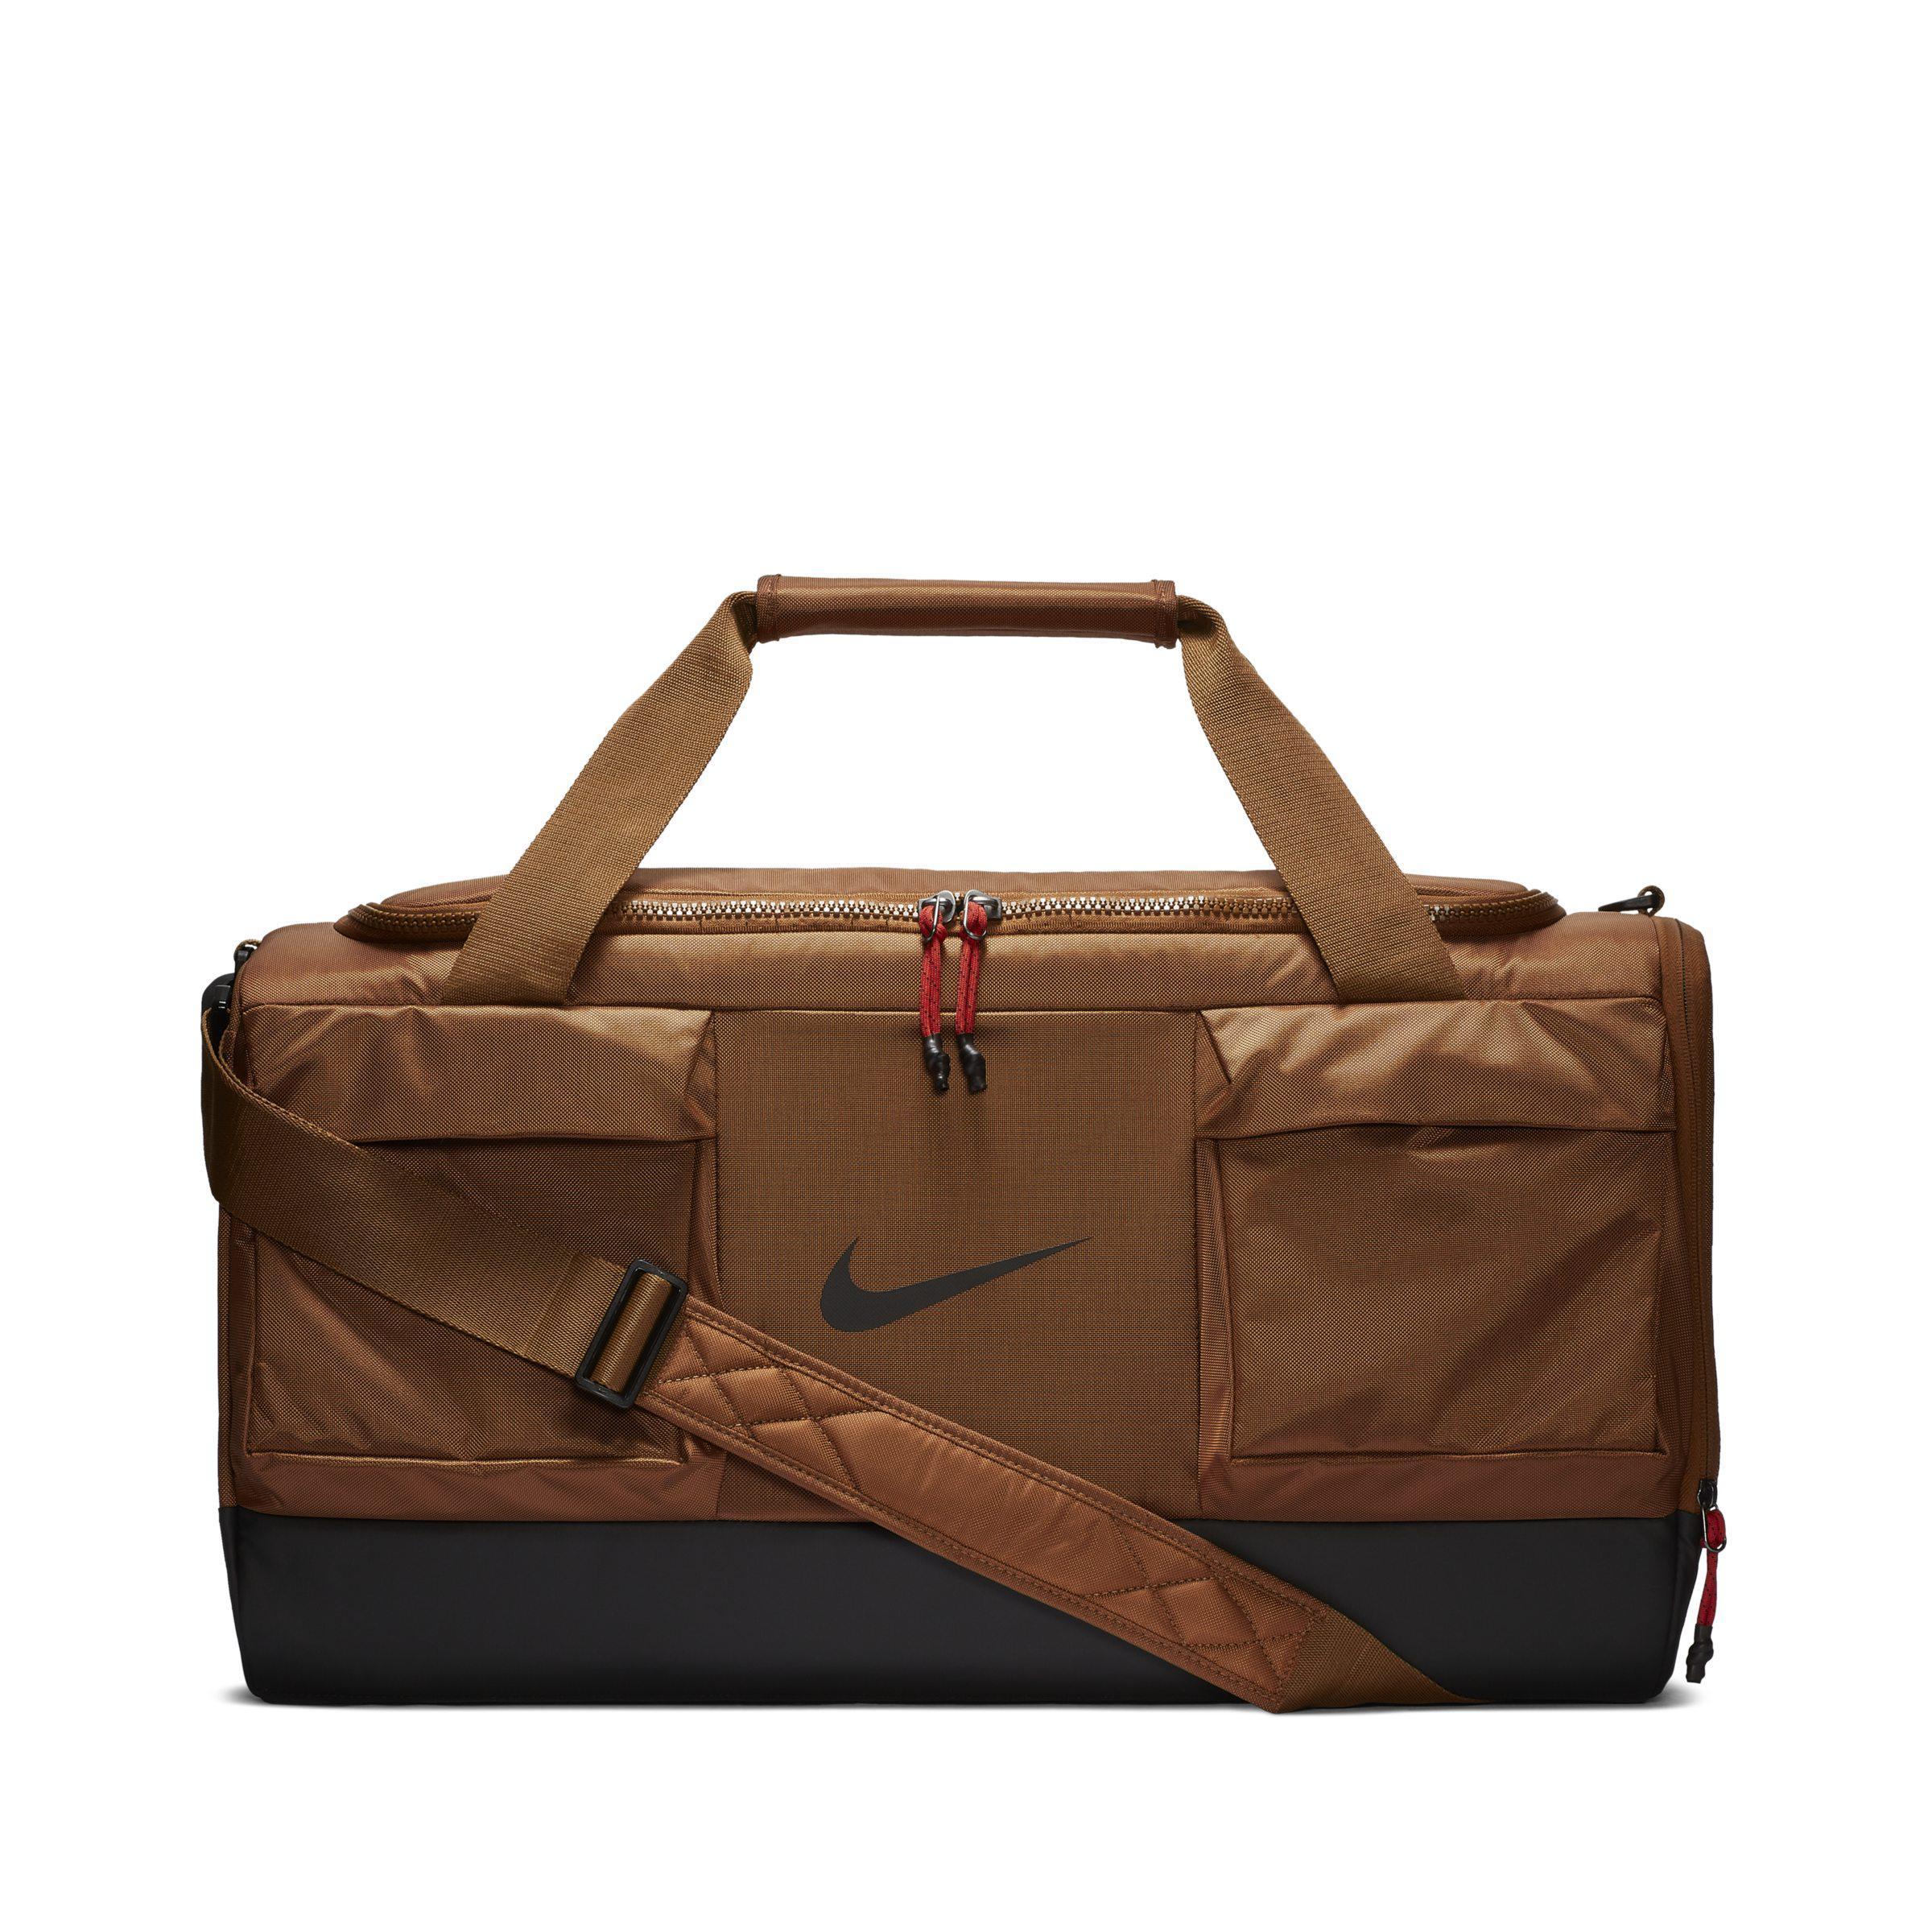 Nike Vapor Power Training Duffel Bag (medium) in Brown for Men - Lyst 02f5b751a6e09